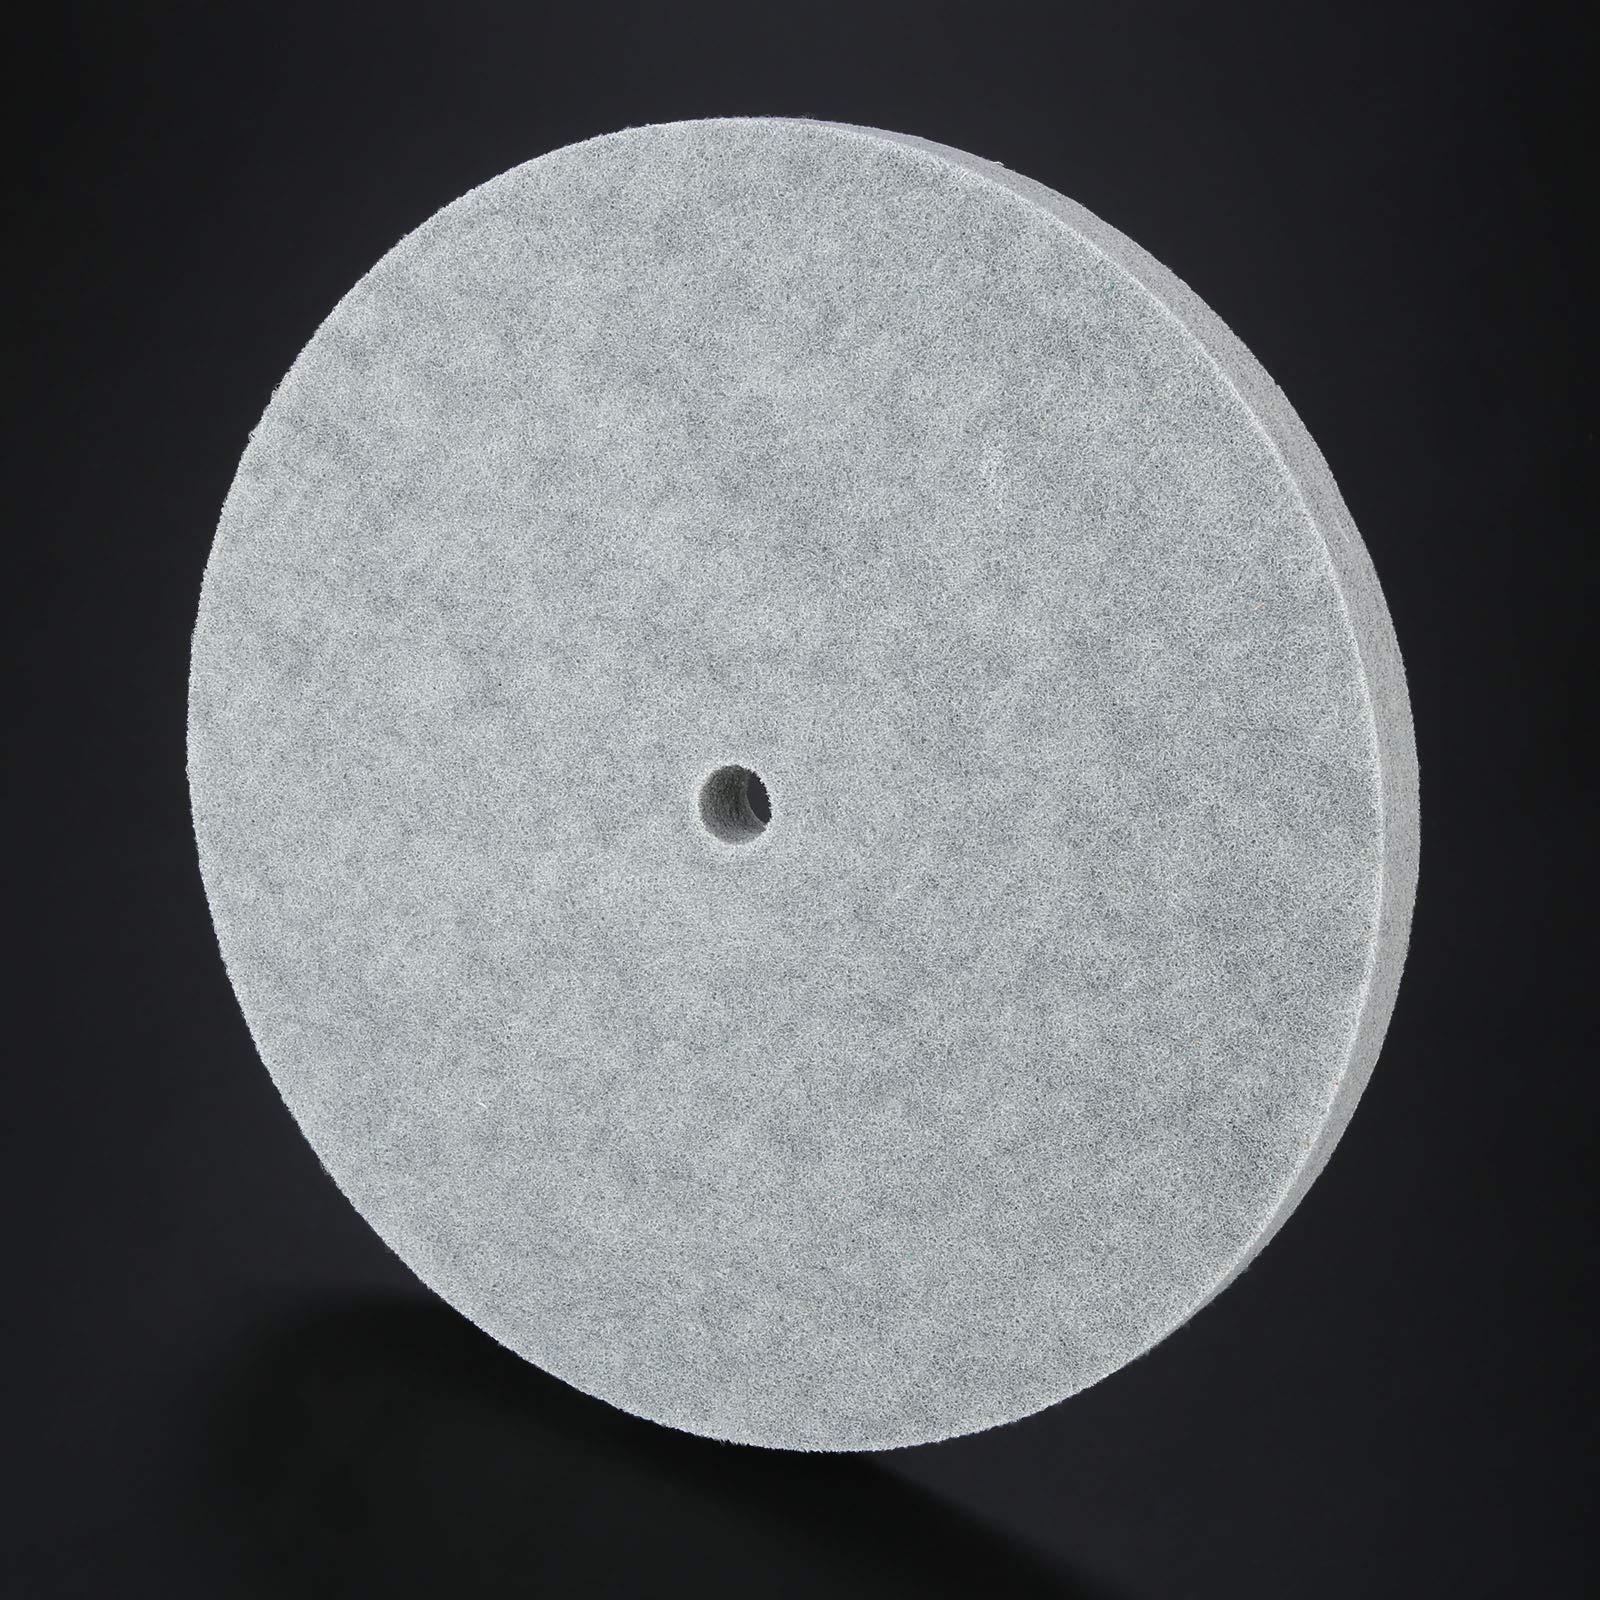 1 PC Thickness Nylon Fiber Polishing Wheel Non-Woven Unitized Wheel 5P 180#, 300MM by Yetaha (Image #5)